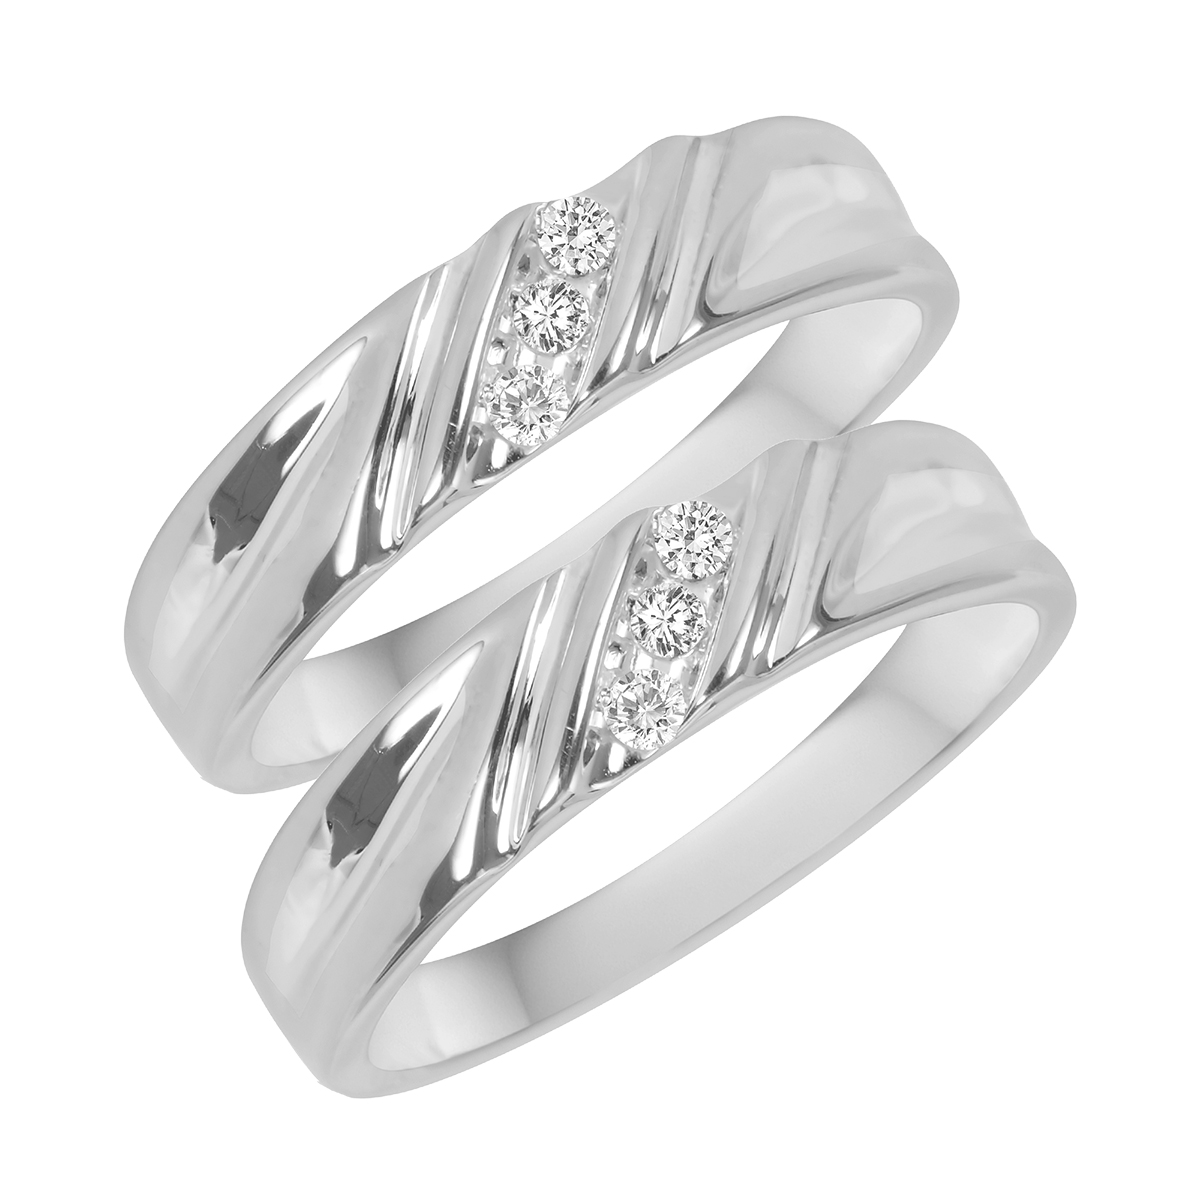 1/10 Carat T.W. Round Cut Mens  Same Sex Wedding Band Set 14K White Gold- Size 8